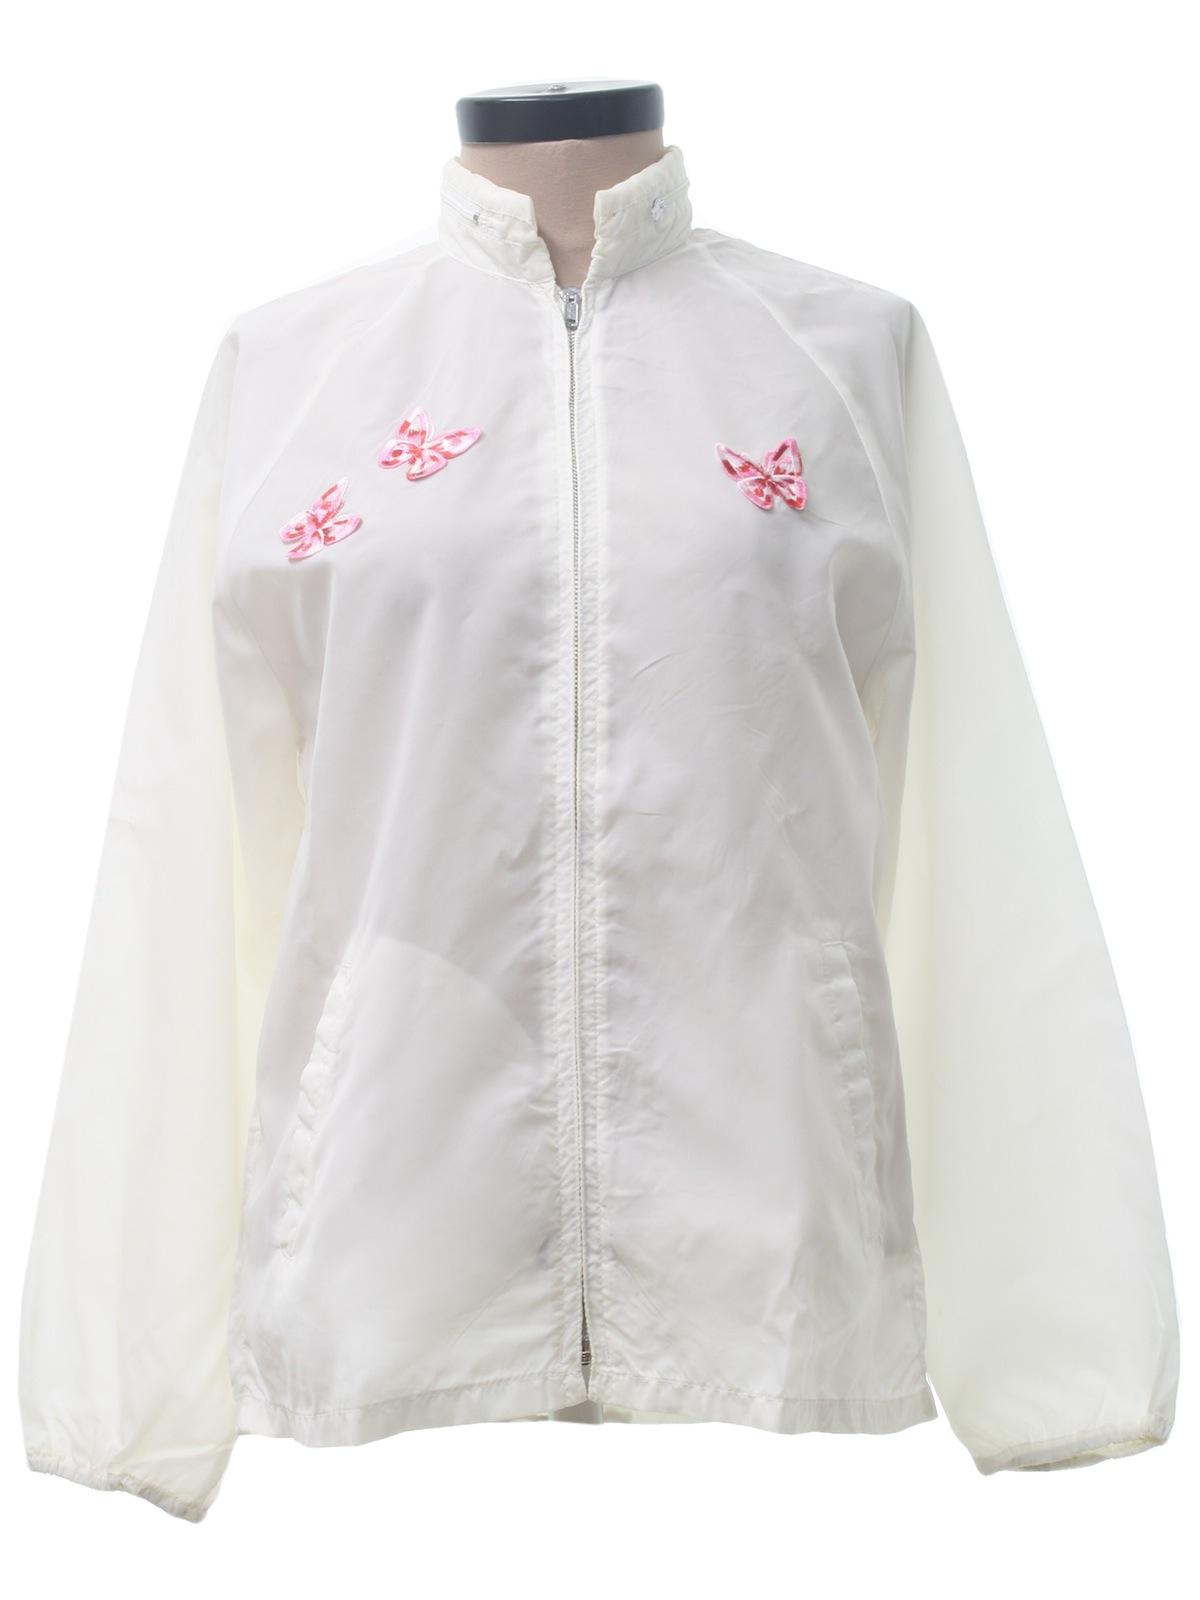 Womens Nylon Windbreaker Jackets - Pl Jackets